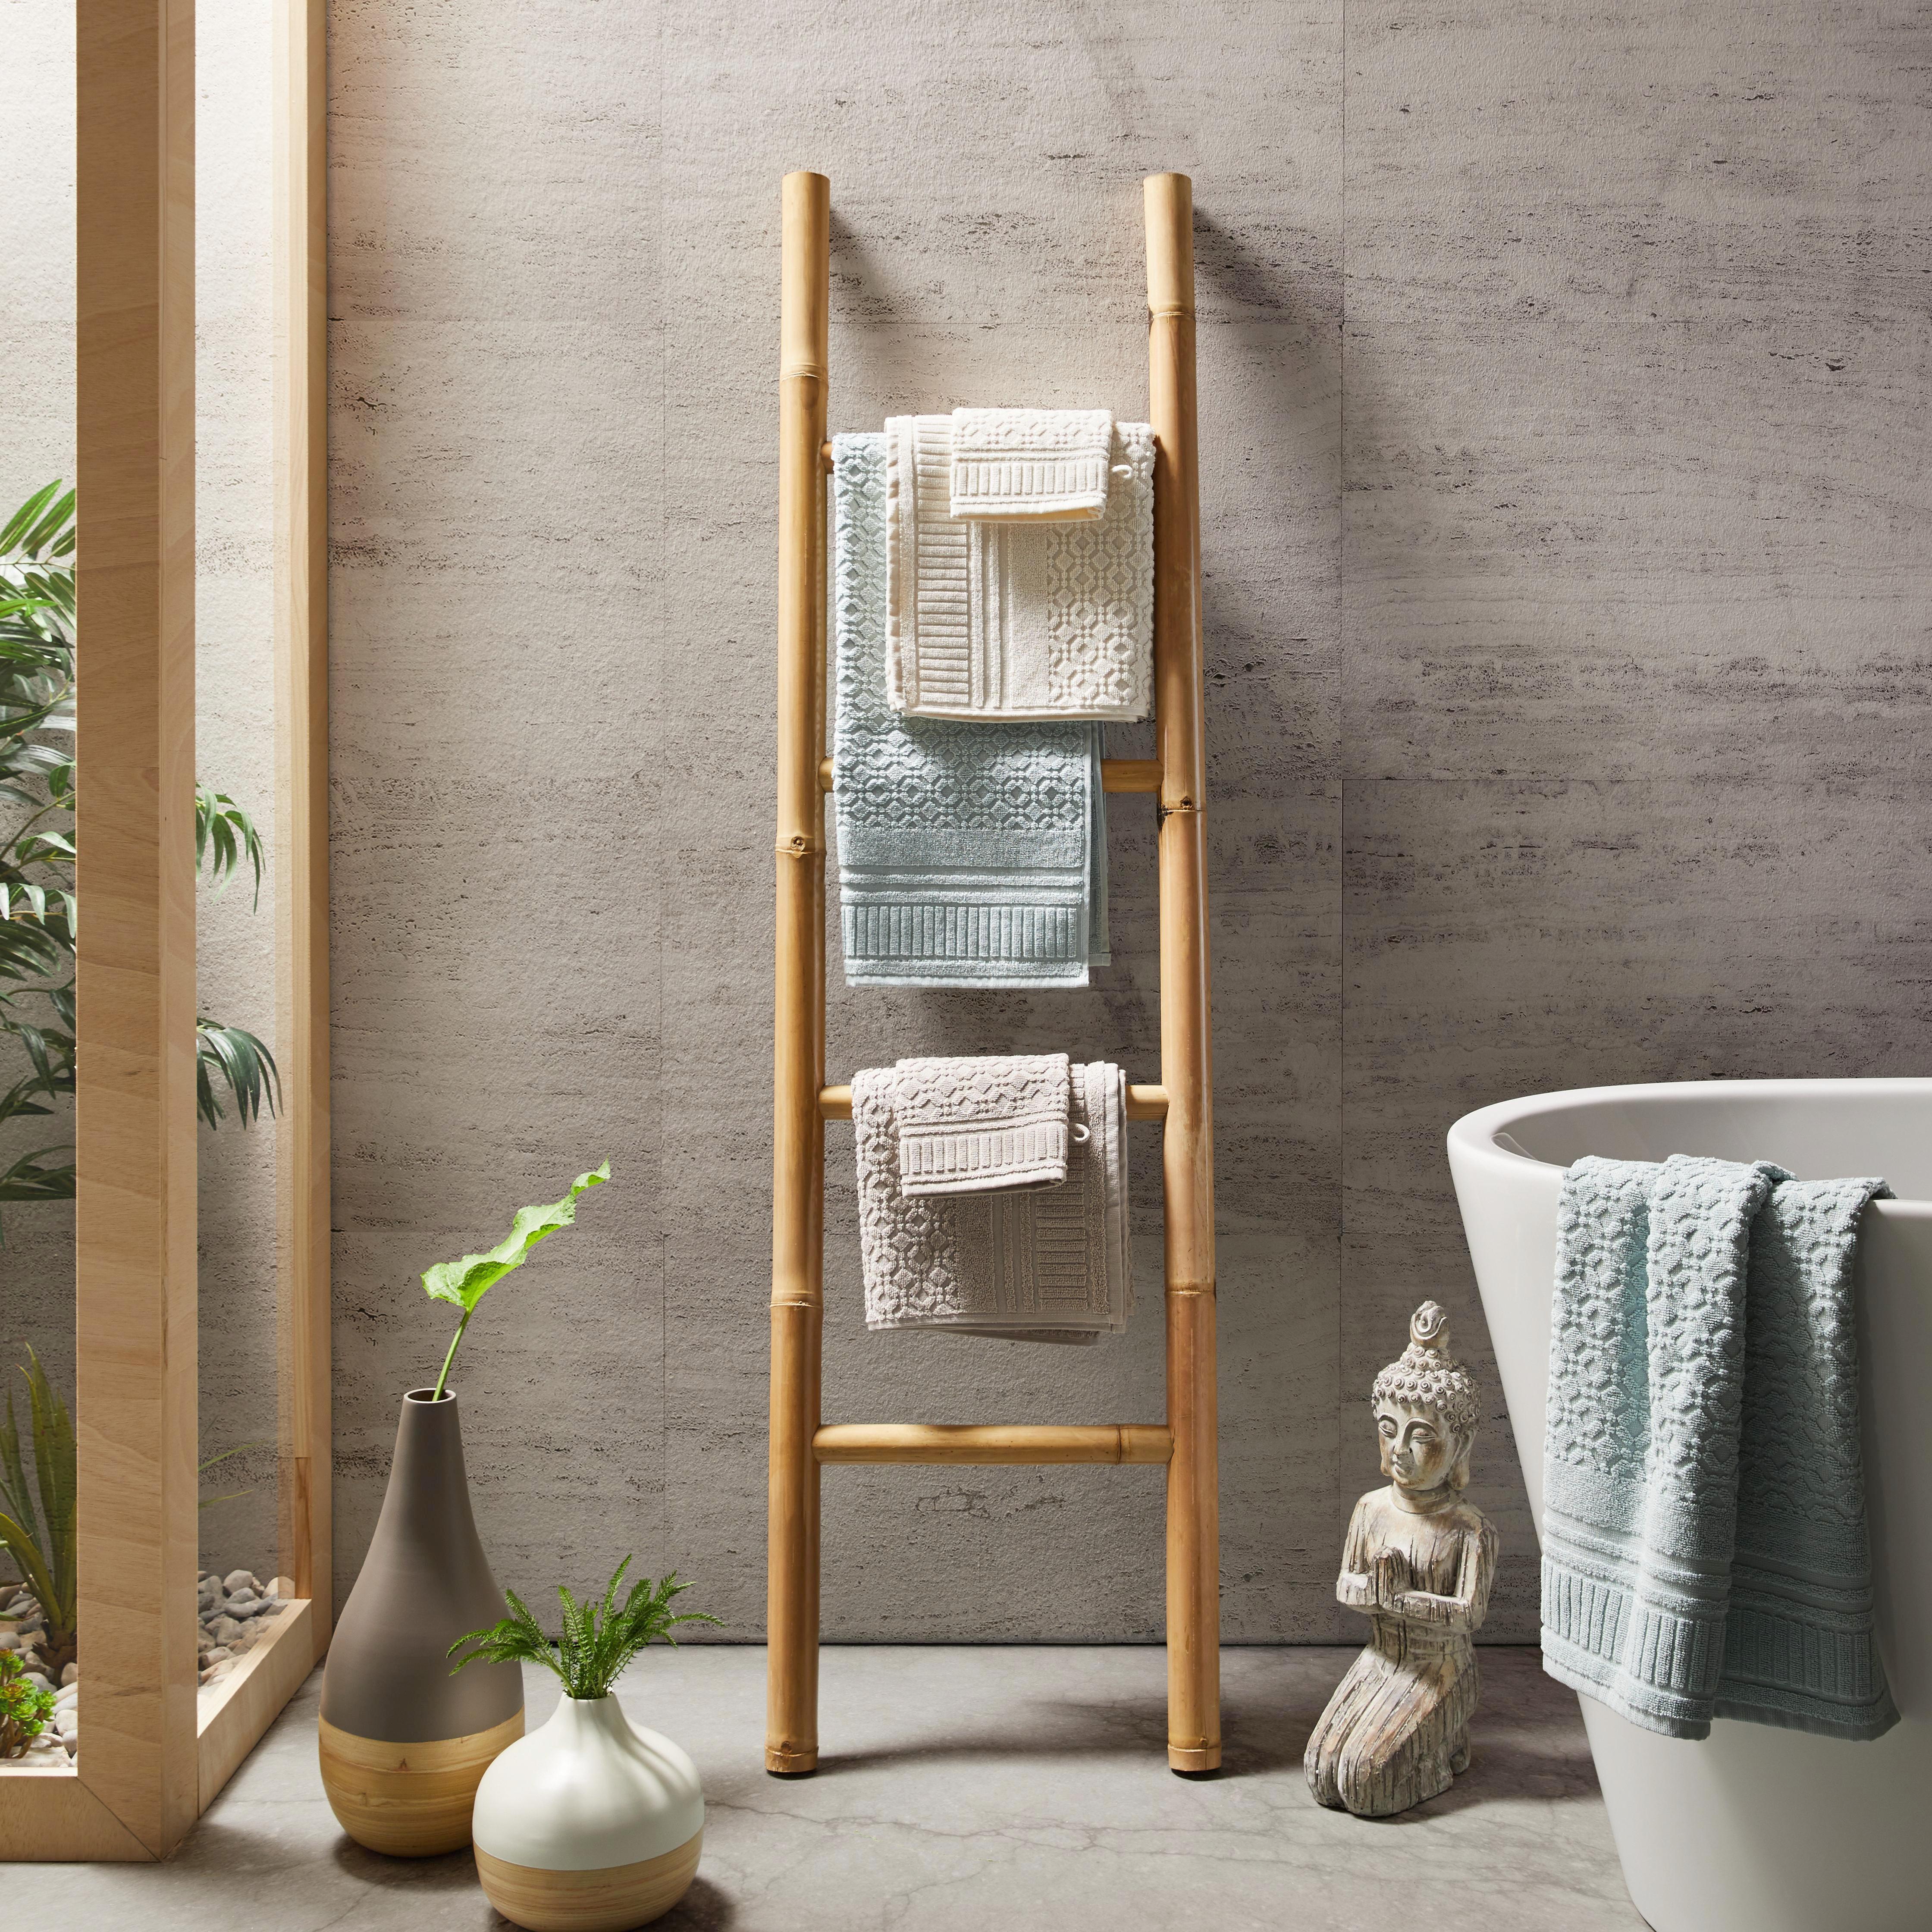 Gästetuch Carina - Weiß, ROMANTIK / LANDHAUS, Textil (30/50cm) - MÖMAX modern living